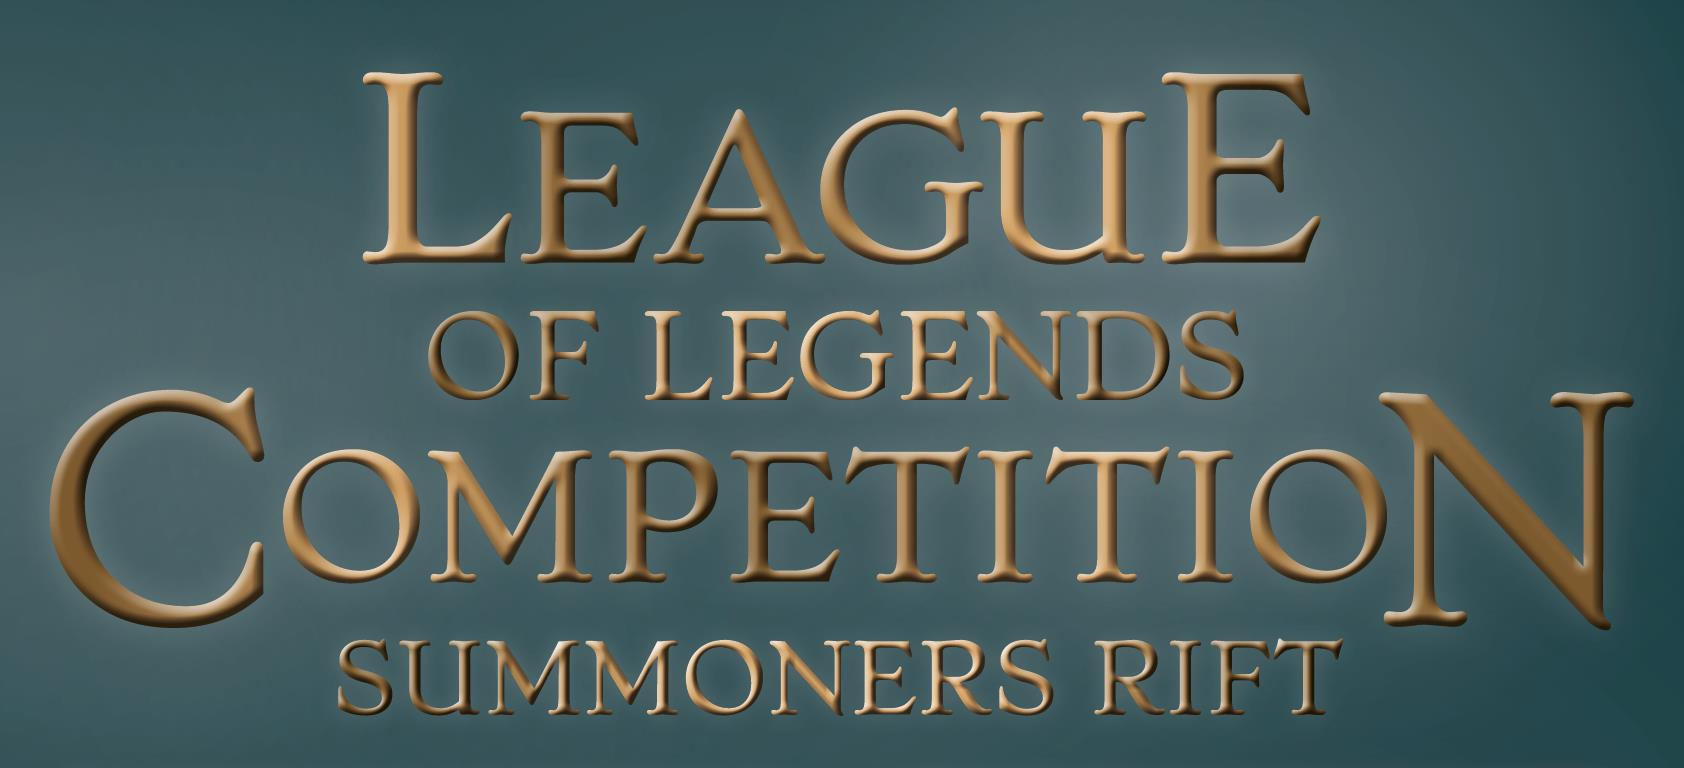 eSports: League of Legends Competition